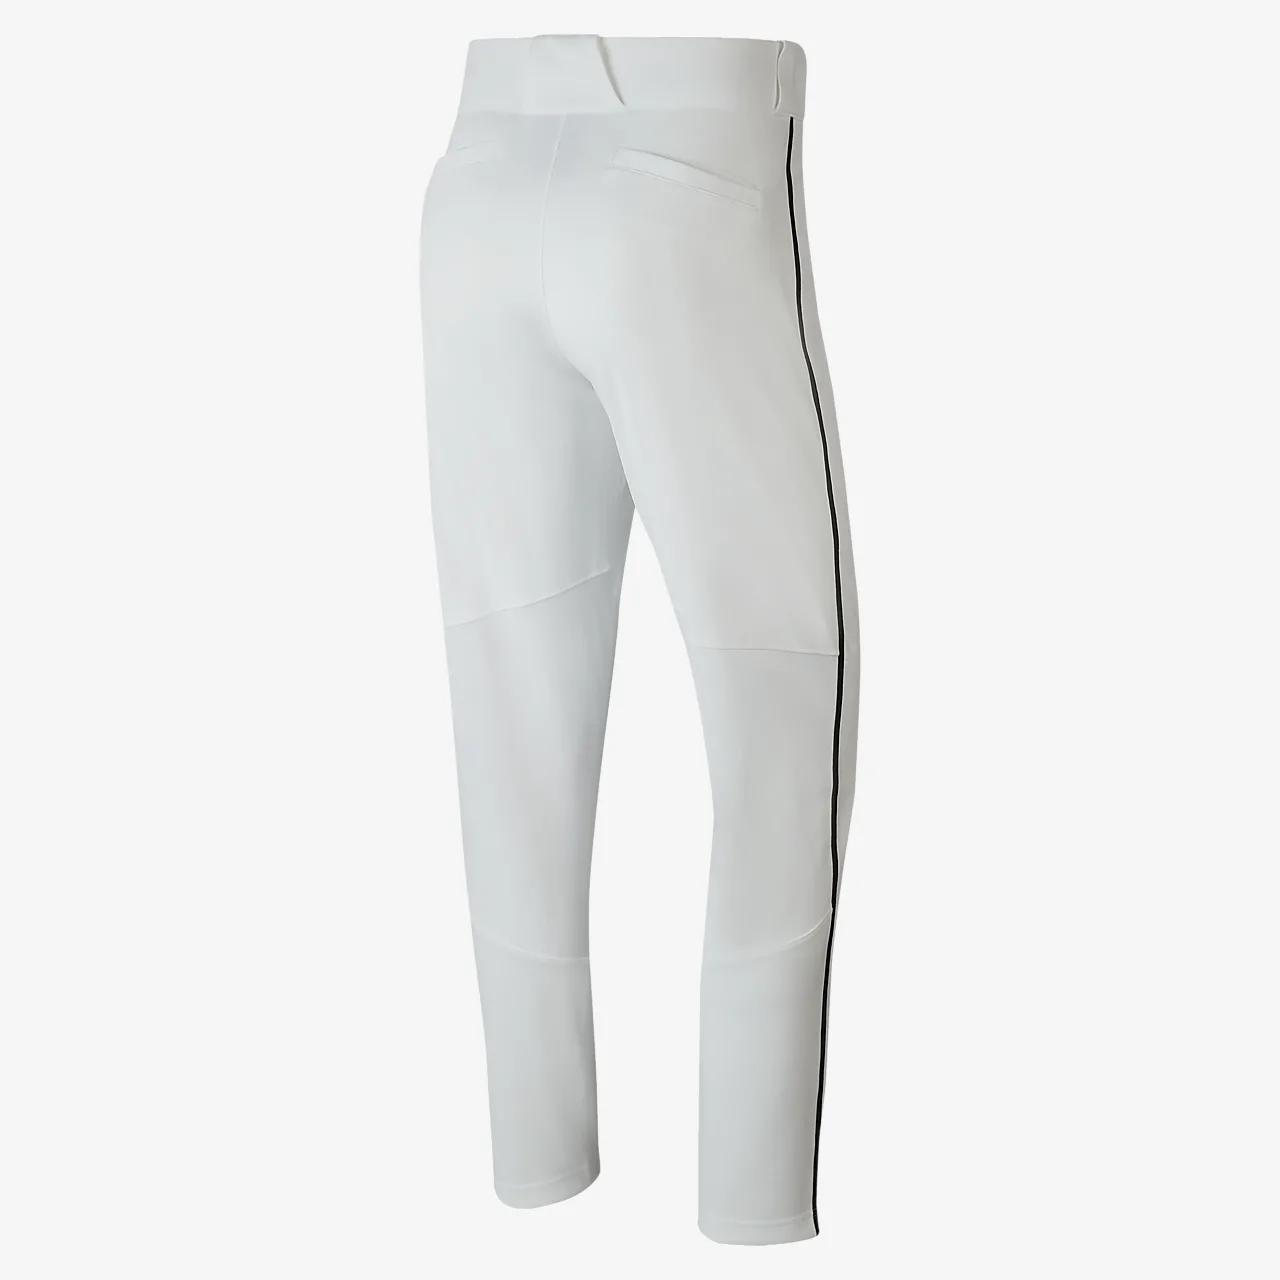 Nike Vapor Select Men's Baseball Pants BQ6435-100